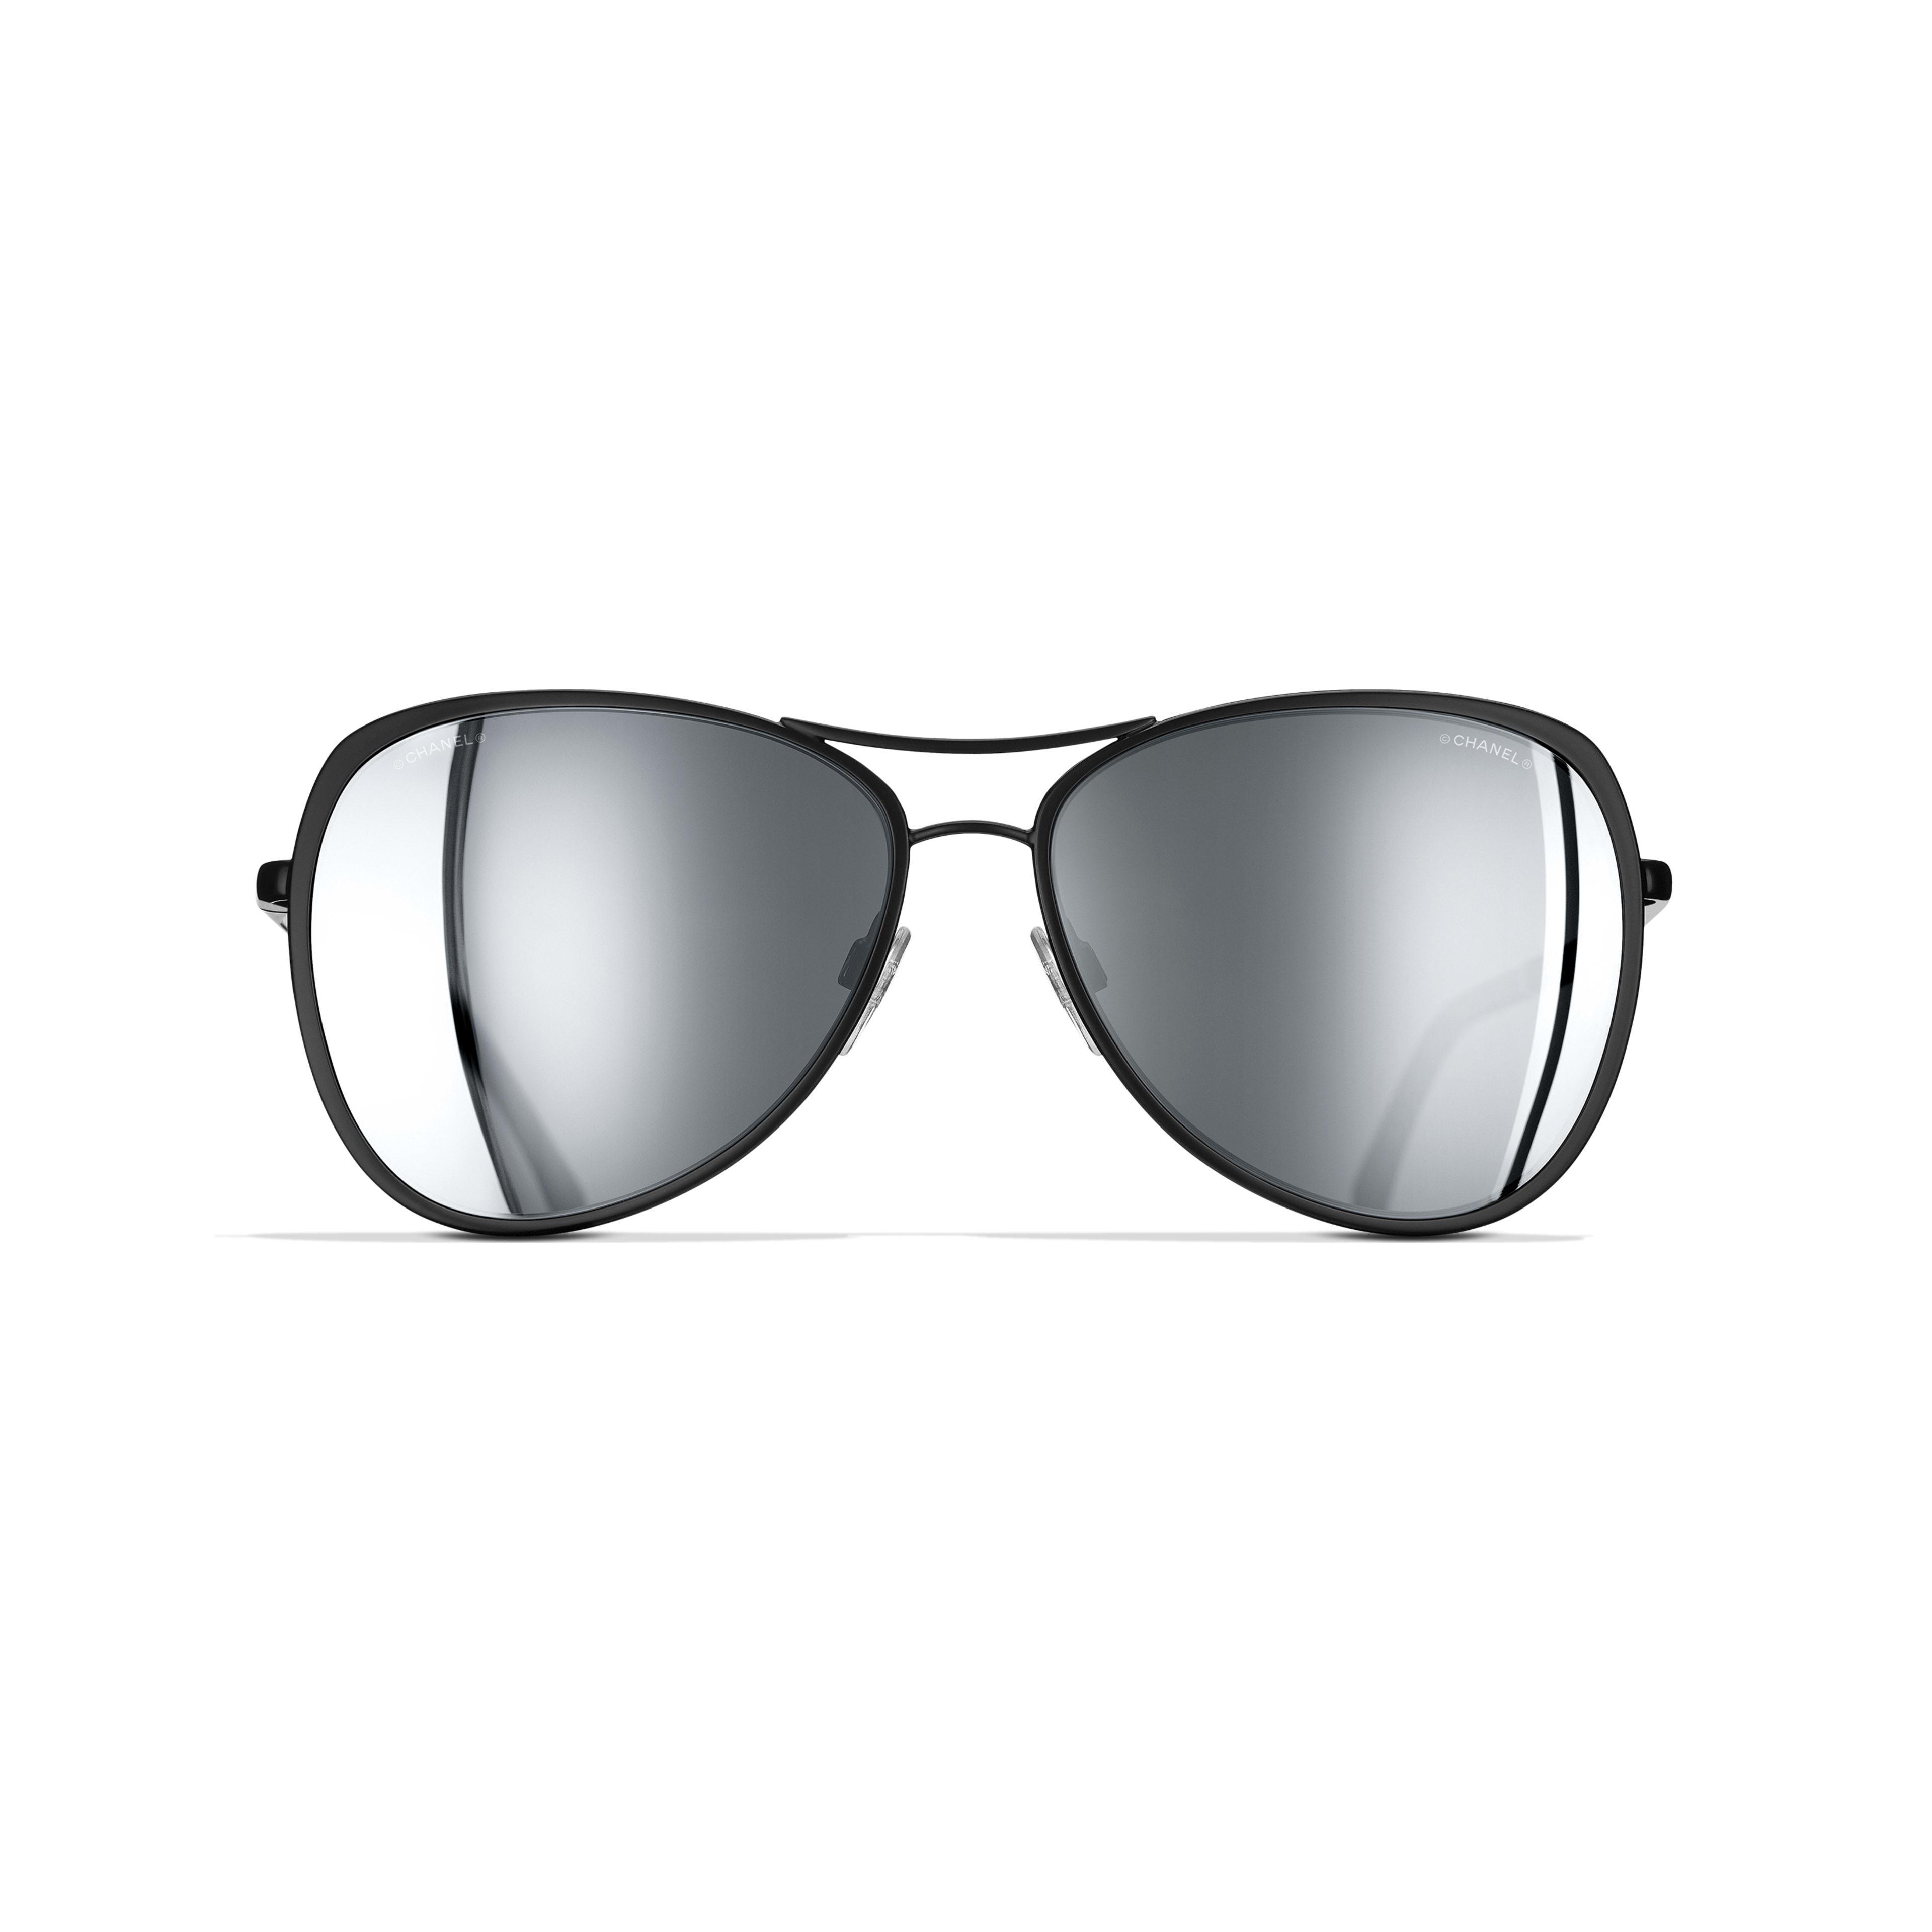 Pilot Sunglasses Metal Black -                                                    view 2 - see full sized version